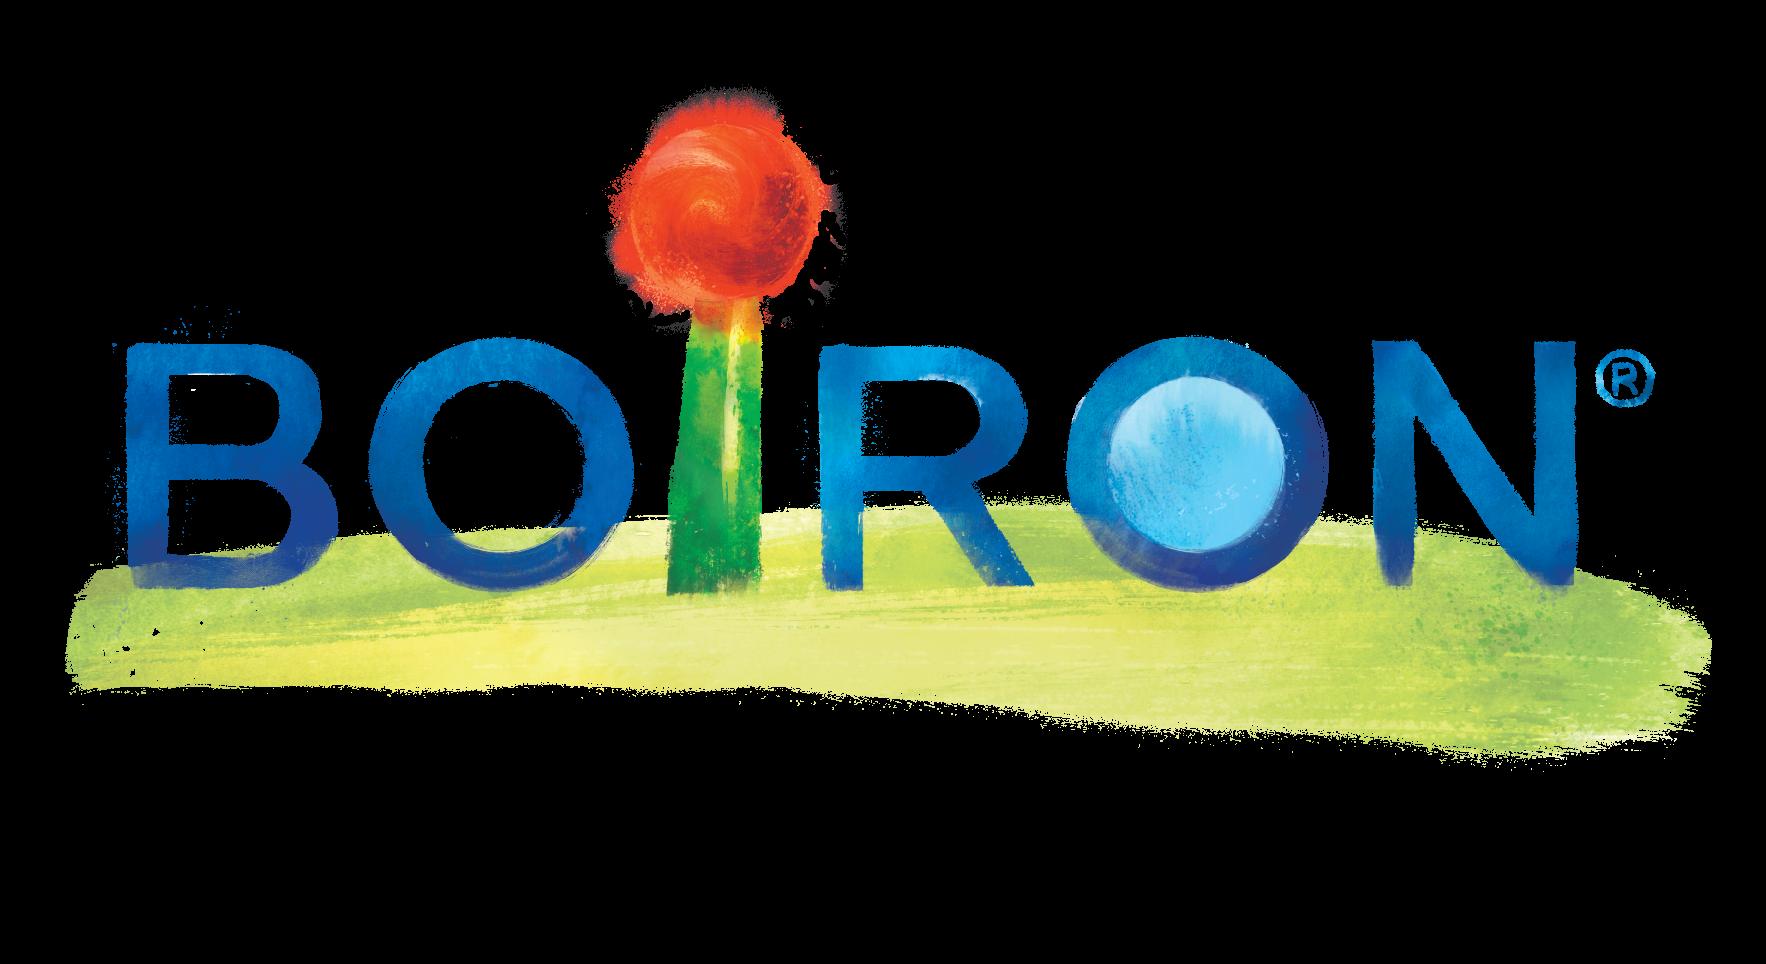 BOIRON-logo-2016-Bleu---CMJ-510mm - Deborah Kelly.png